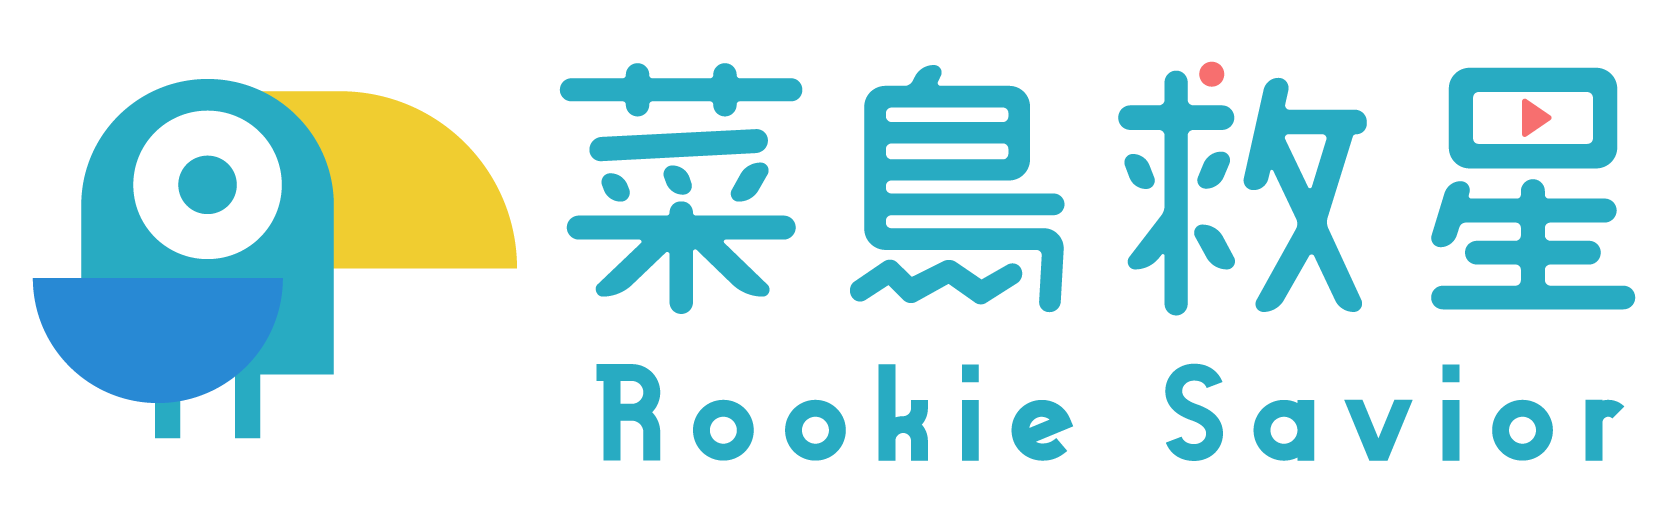 Rookiesavior_logo